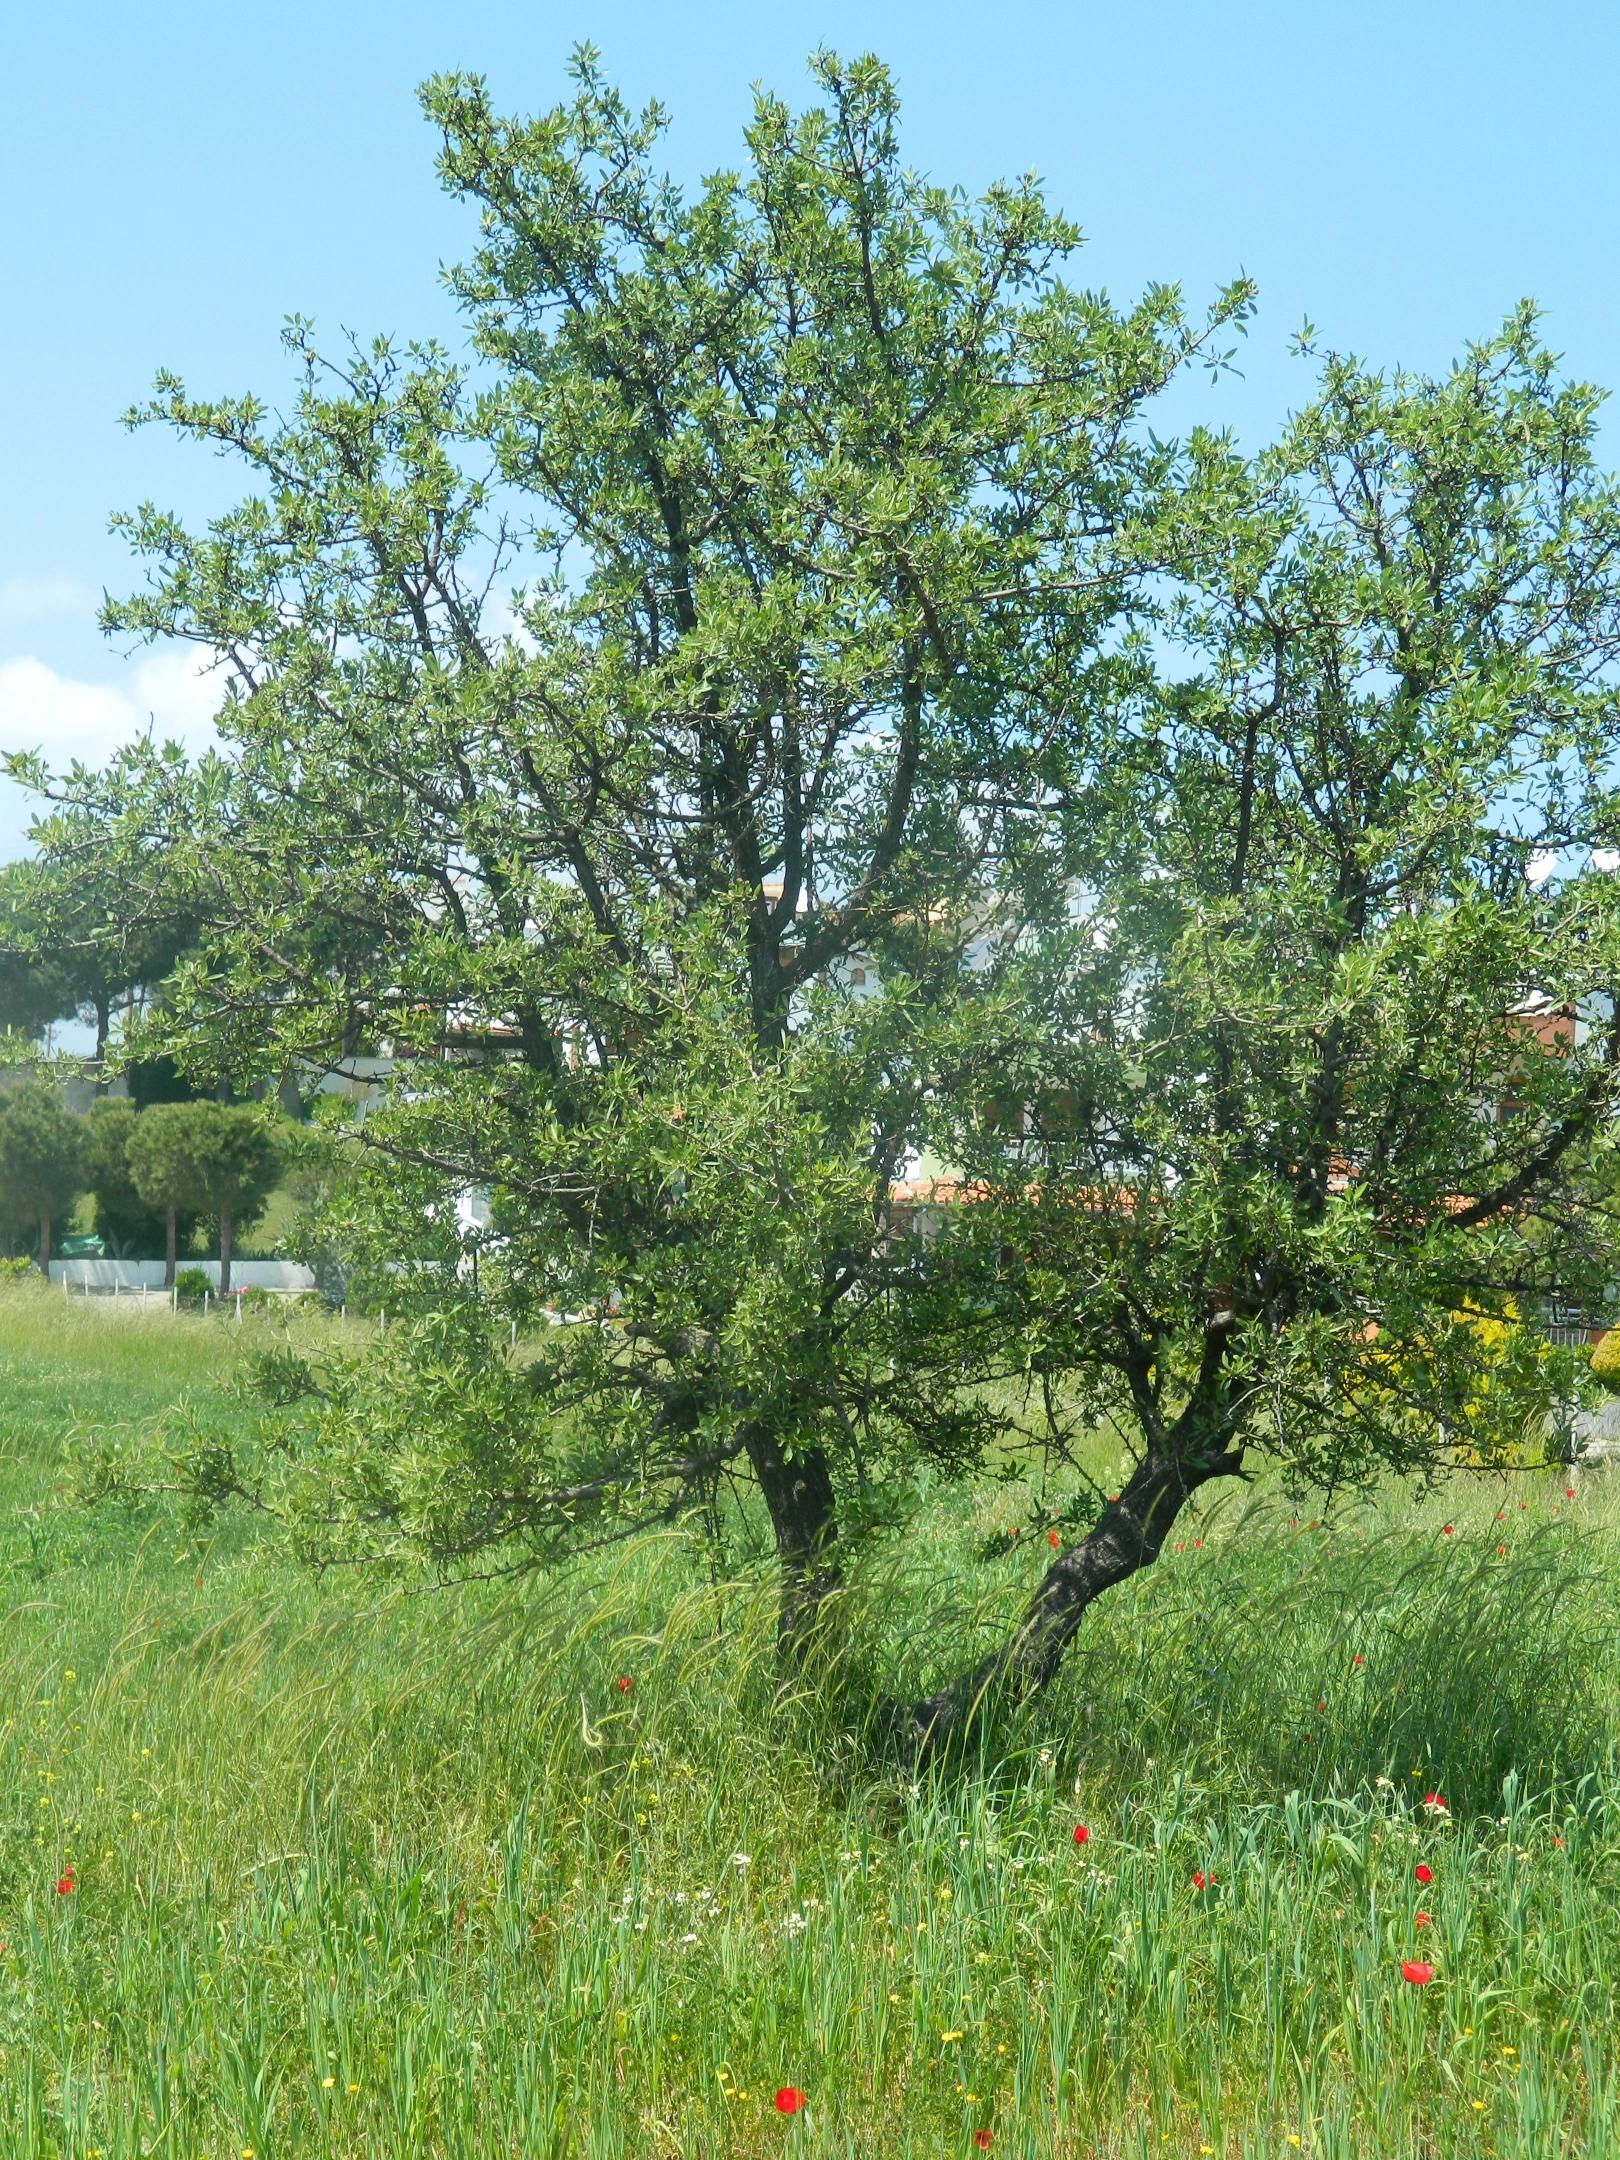 Green Tree, Grass, Green, Nature, Summer, HQ Photo